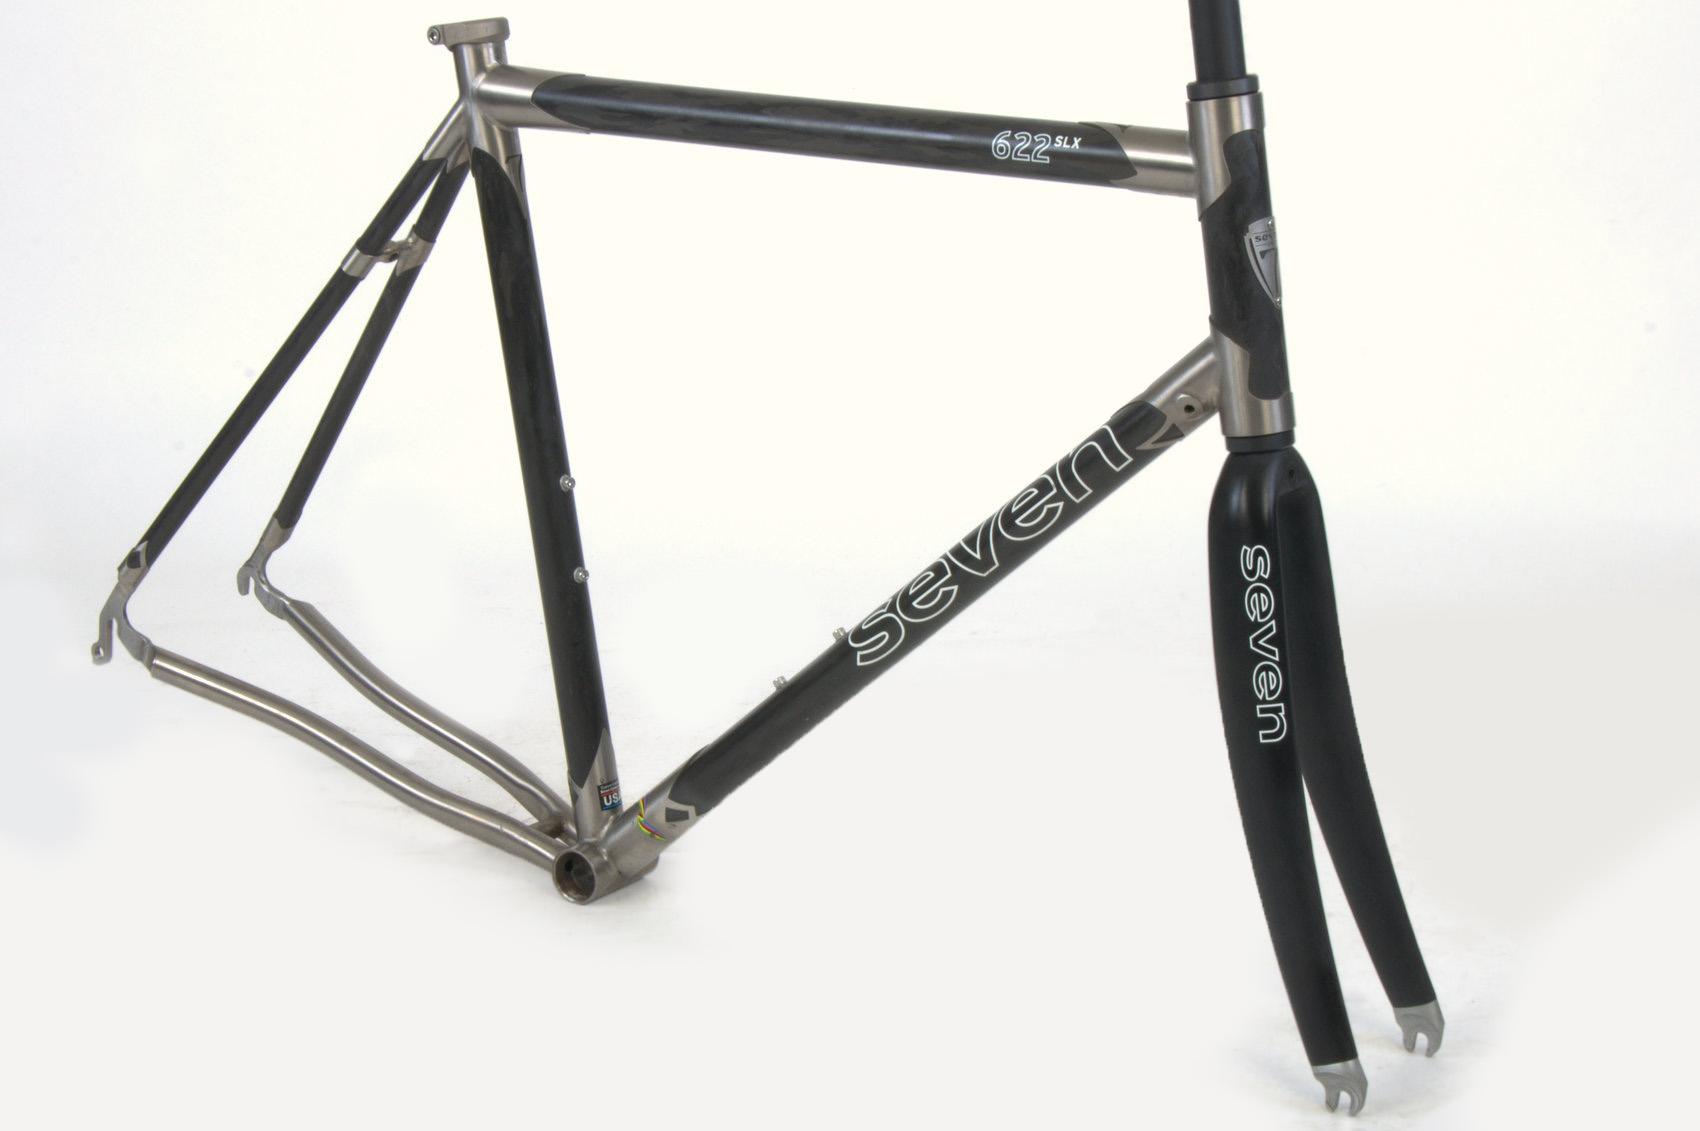 622 XX Frame Special 577tt